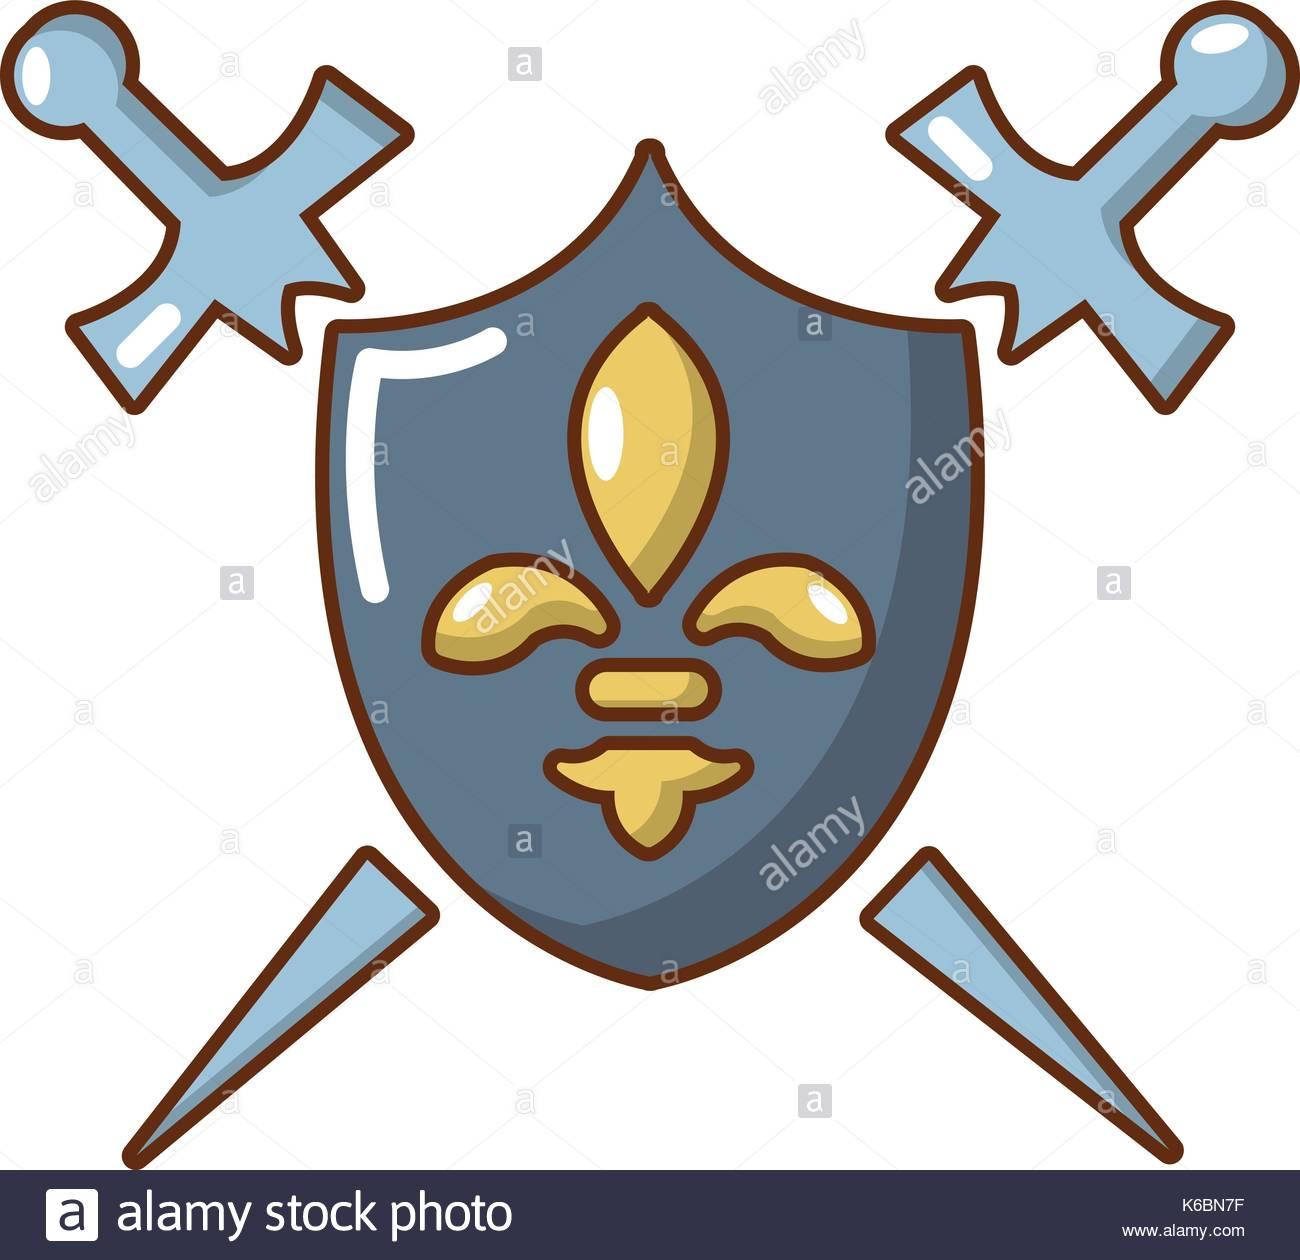 1300x1260 Shield Sword Cartoon Stock Photos Amp Shield Sword Cartoon Stock